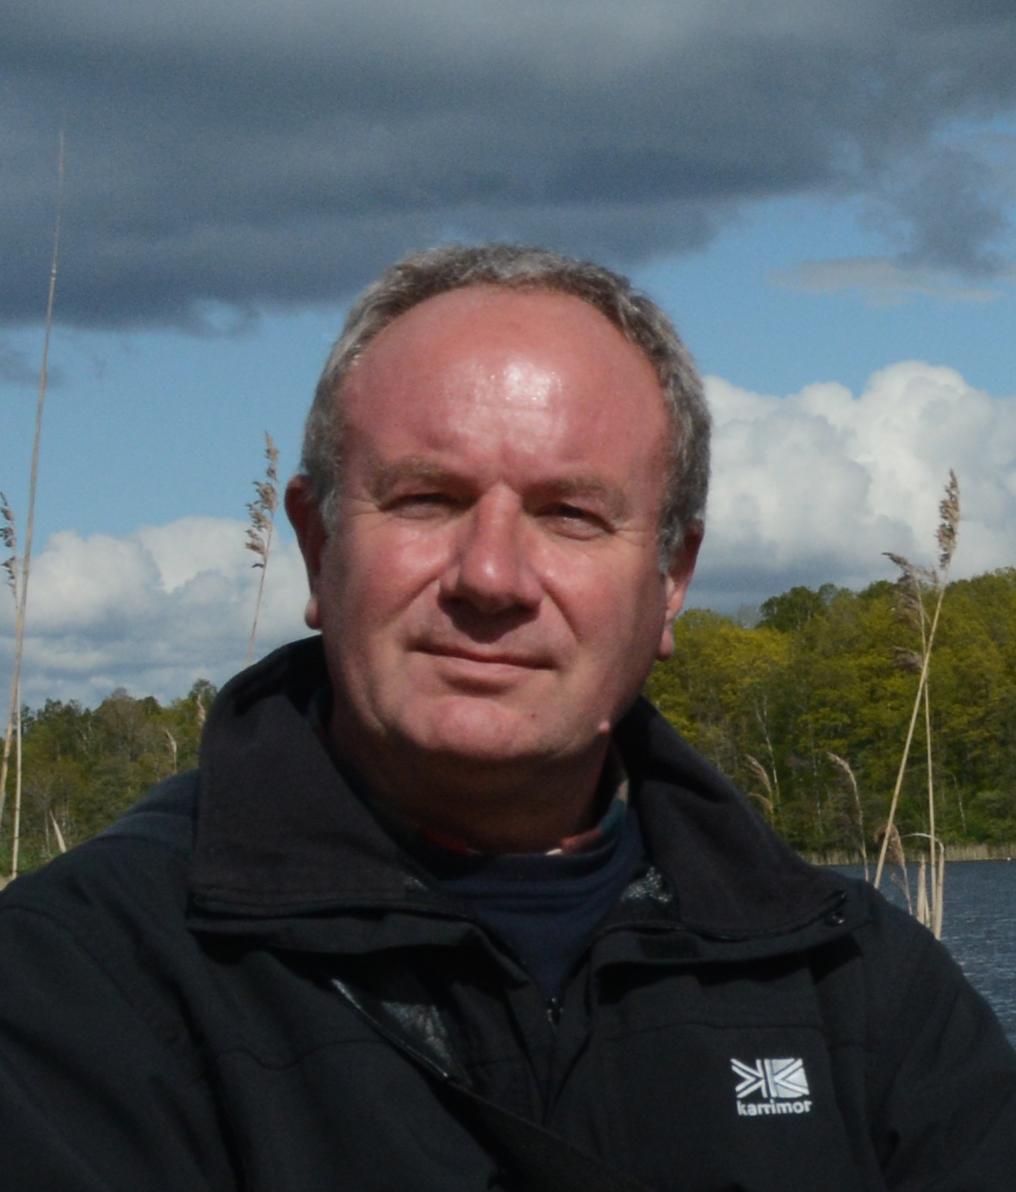 Guido Lurquin